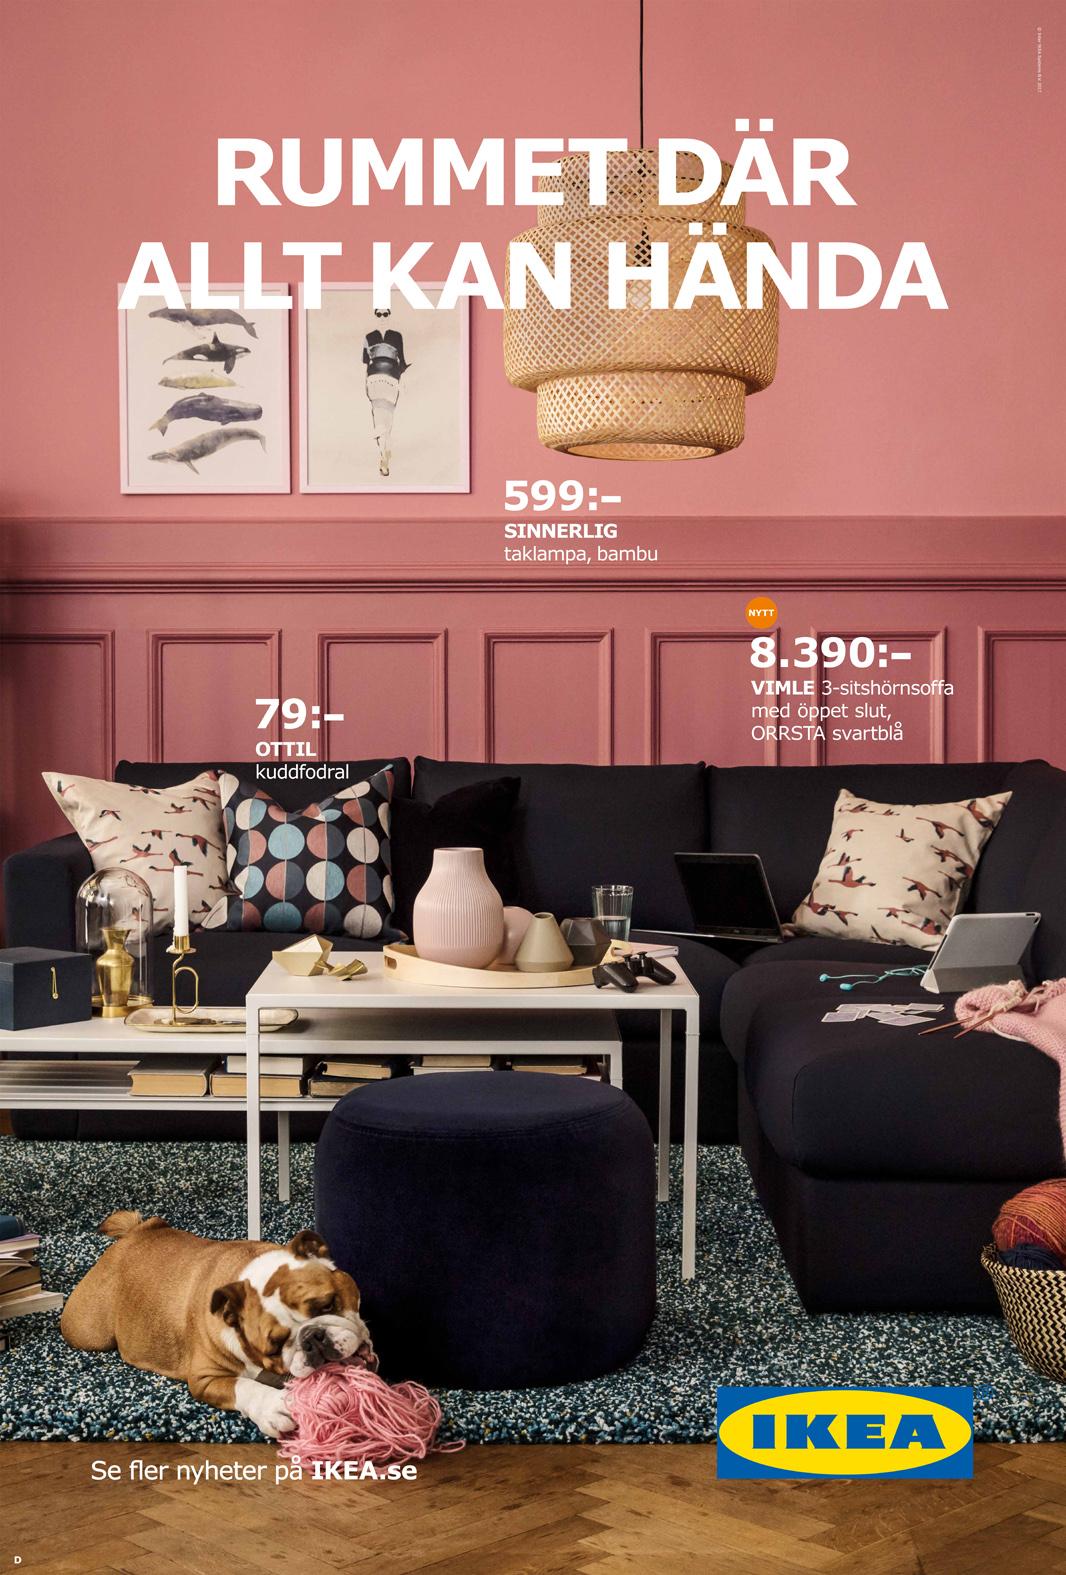 IKEA1807_ACT1_eurosize_forfest_1185x1750_OK-2